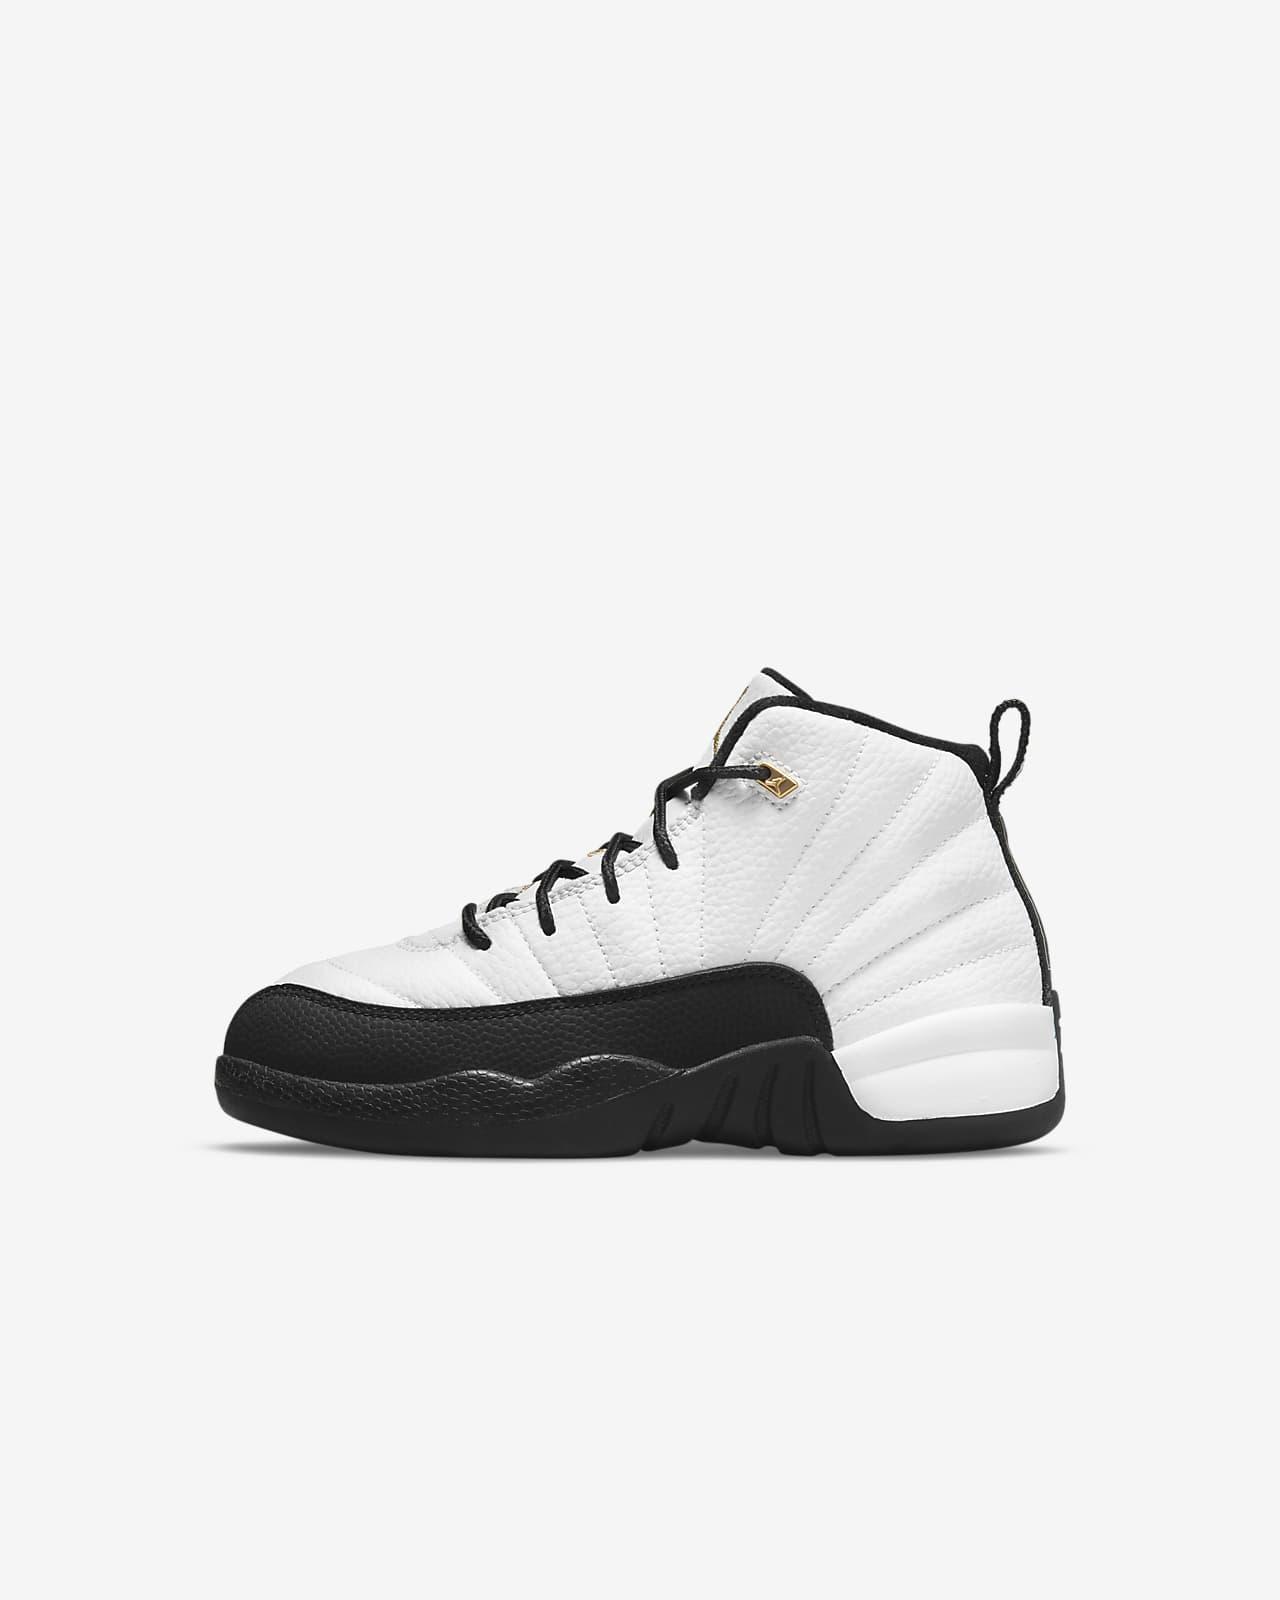 Jordan 12 Retro (PS) 复刻幼童运动童鞋